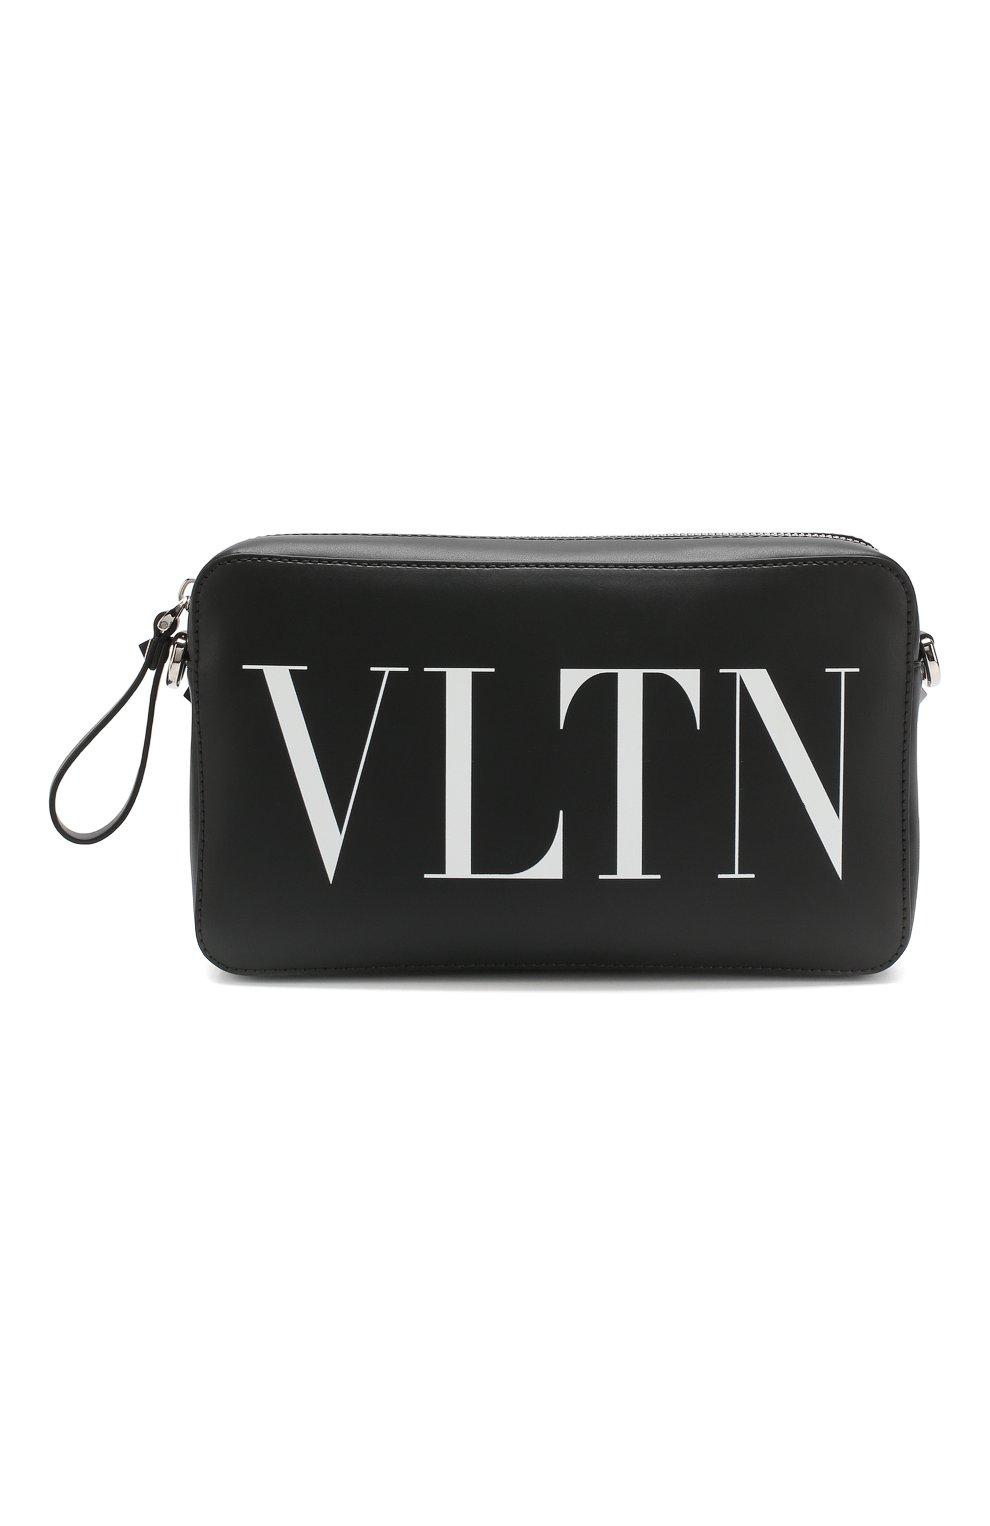 ebf97b1b4fbf Мужская черная кожаная сумка valentino garavani vltn VALENTINO ...